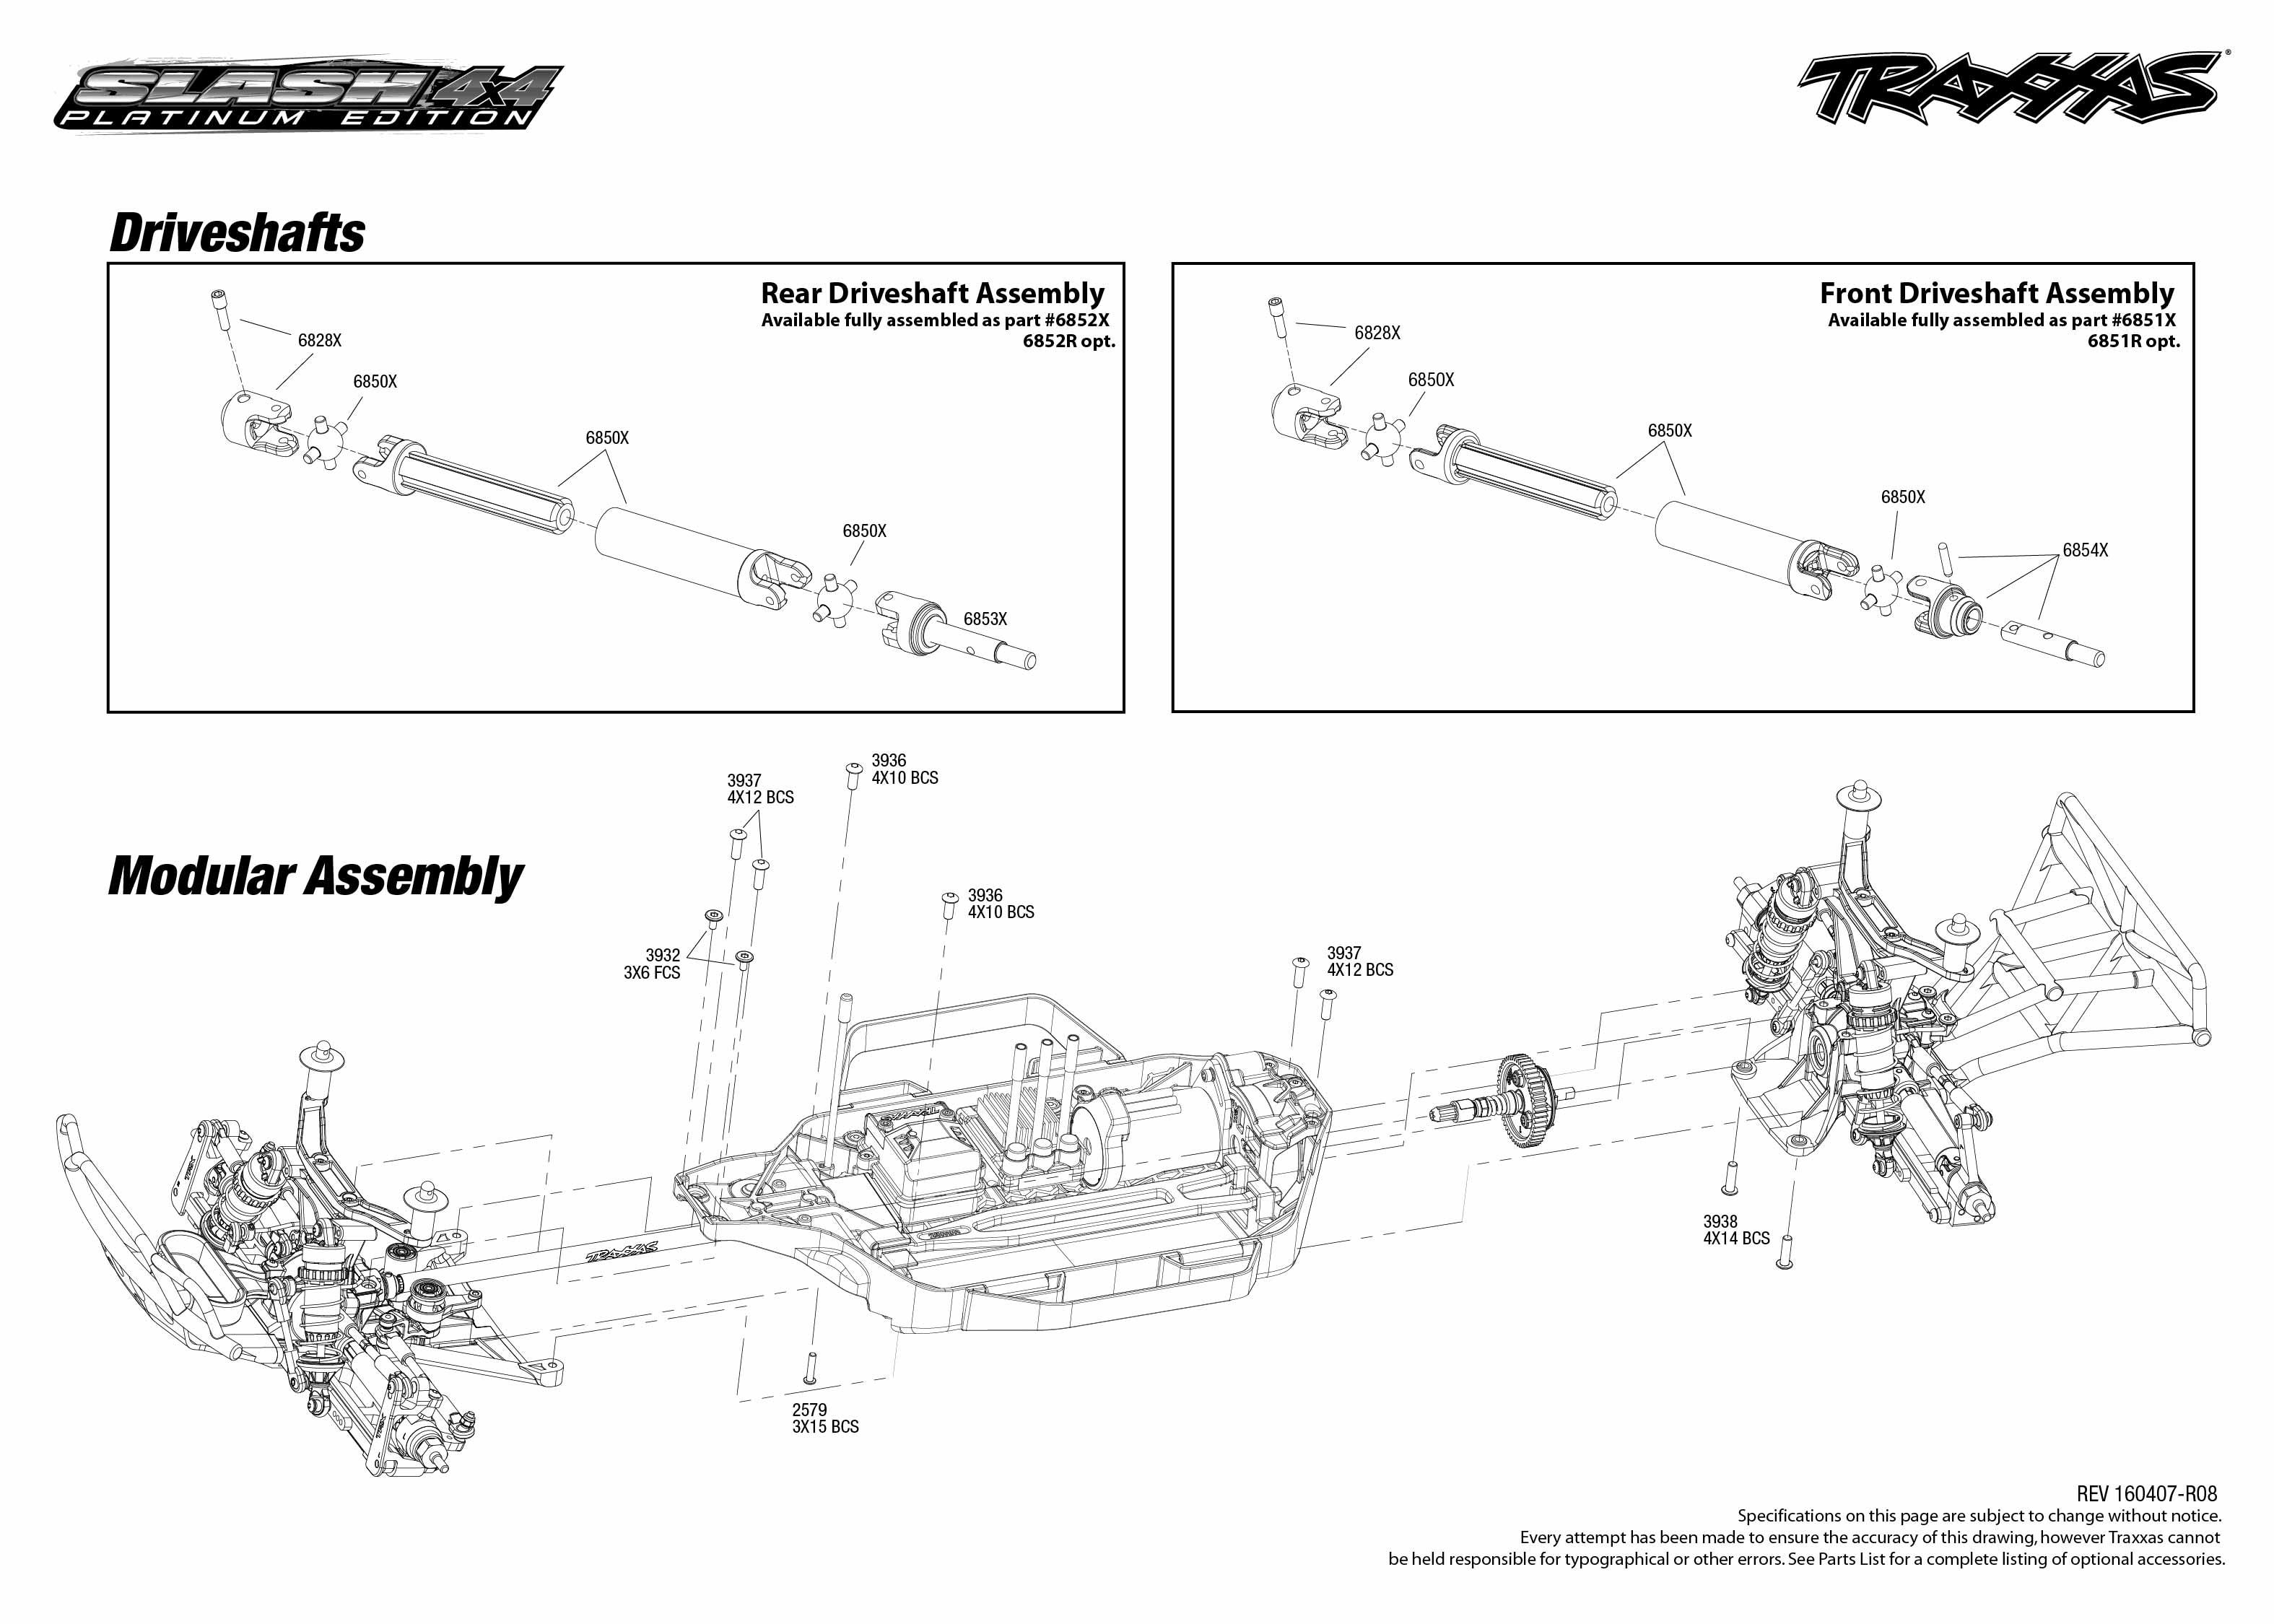 Traxxas Slash 4x4 Wiring Diagram Detailed Diagrams Schematic Parts List Circuit